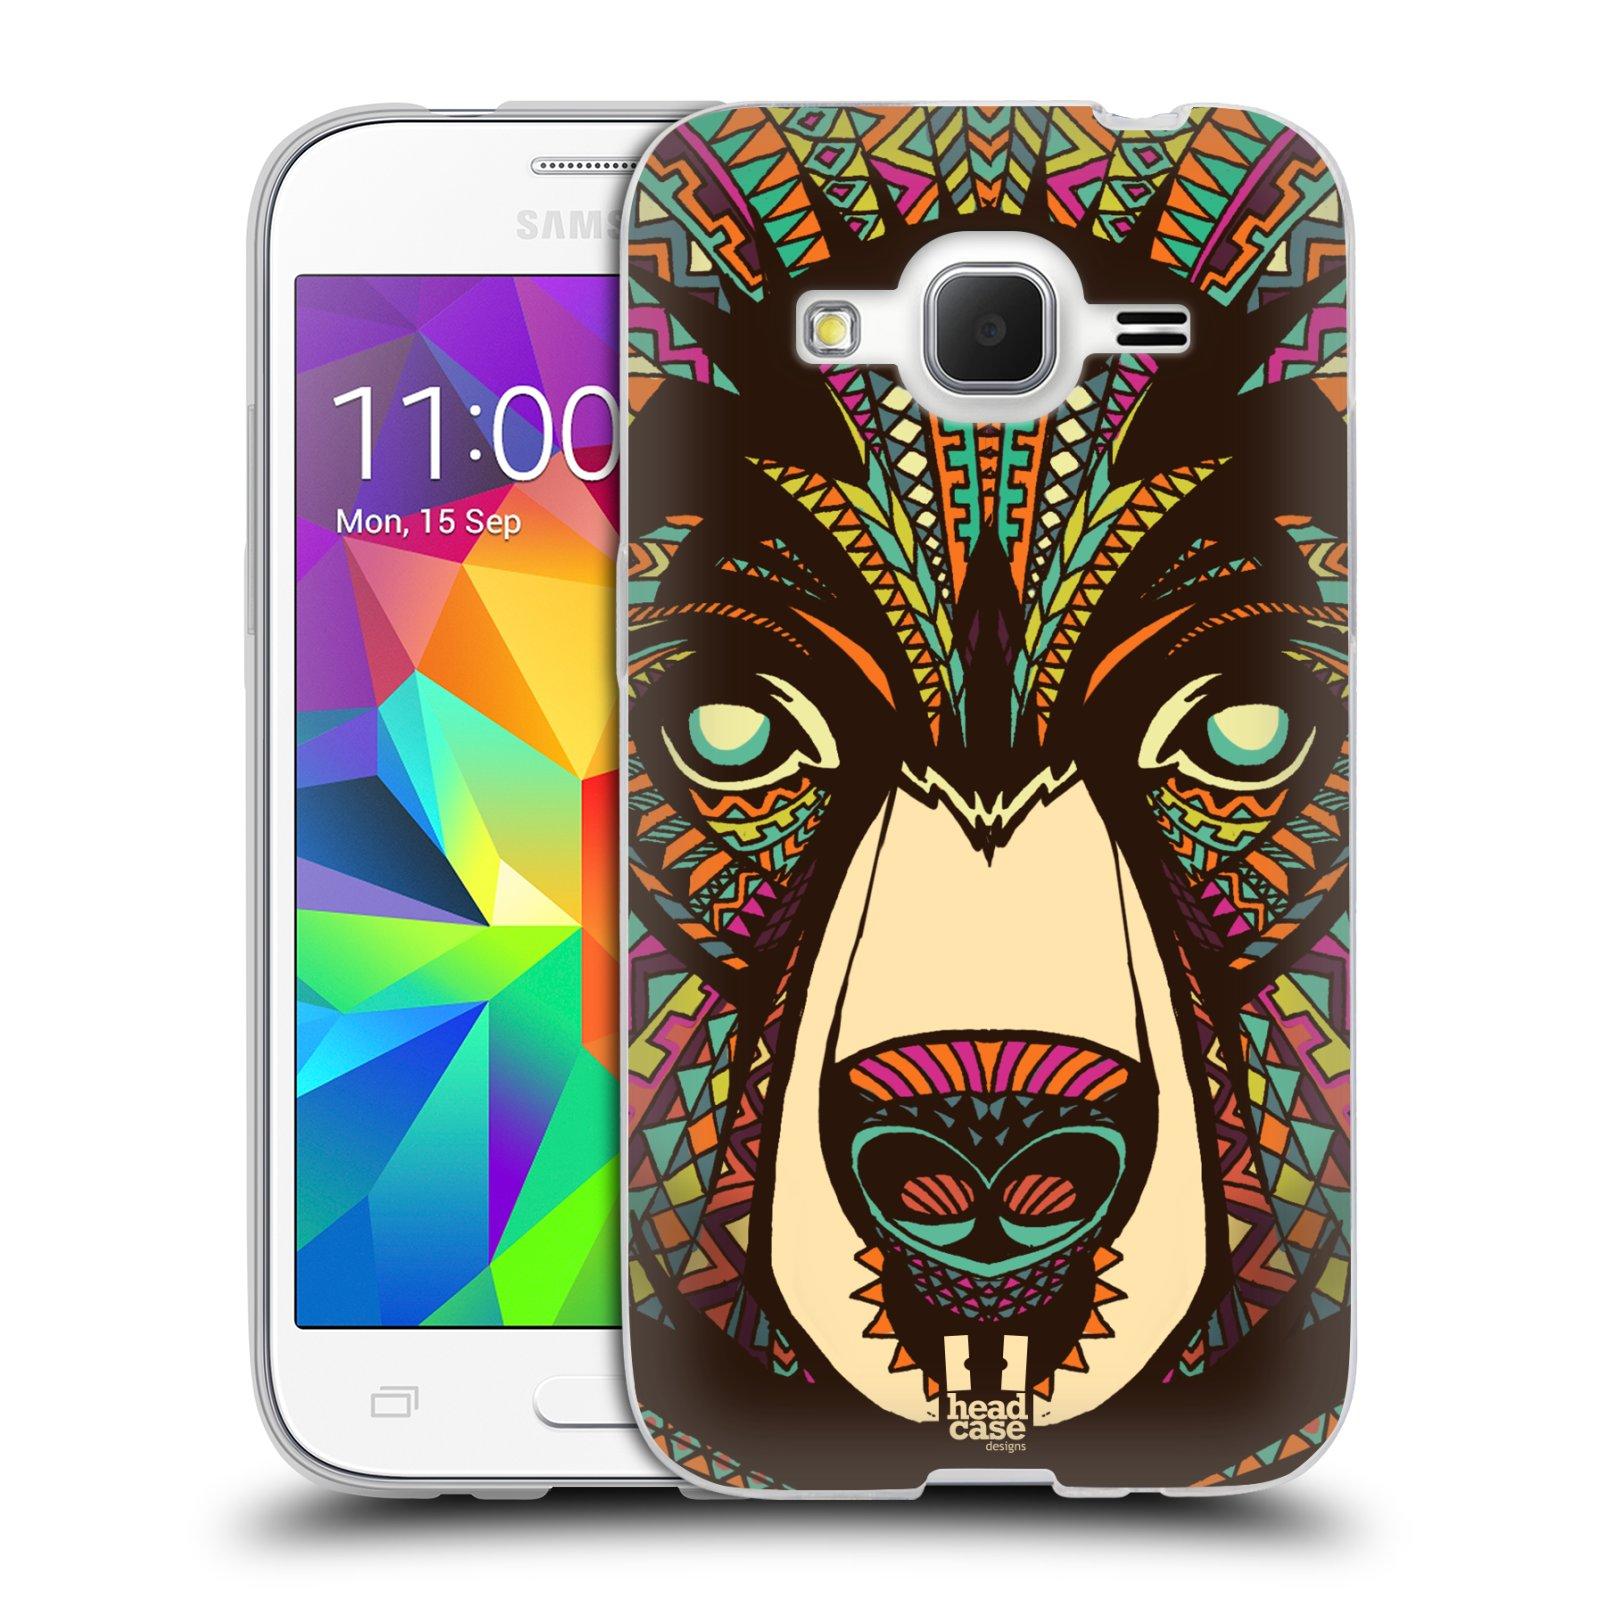 Silikonové pouzdro na mobil Samsung Galaxy Core Prime LTE HEAD CASE AZTEC MEDVĚD